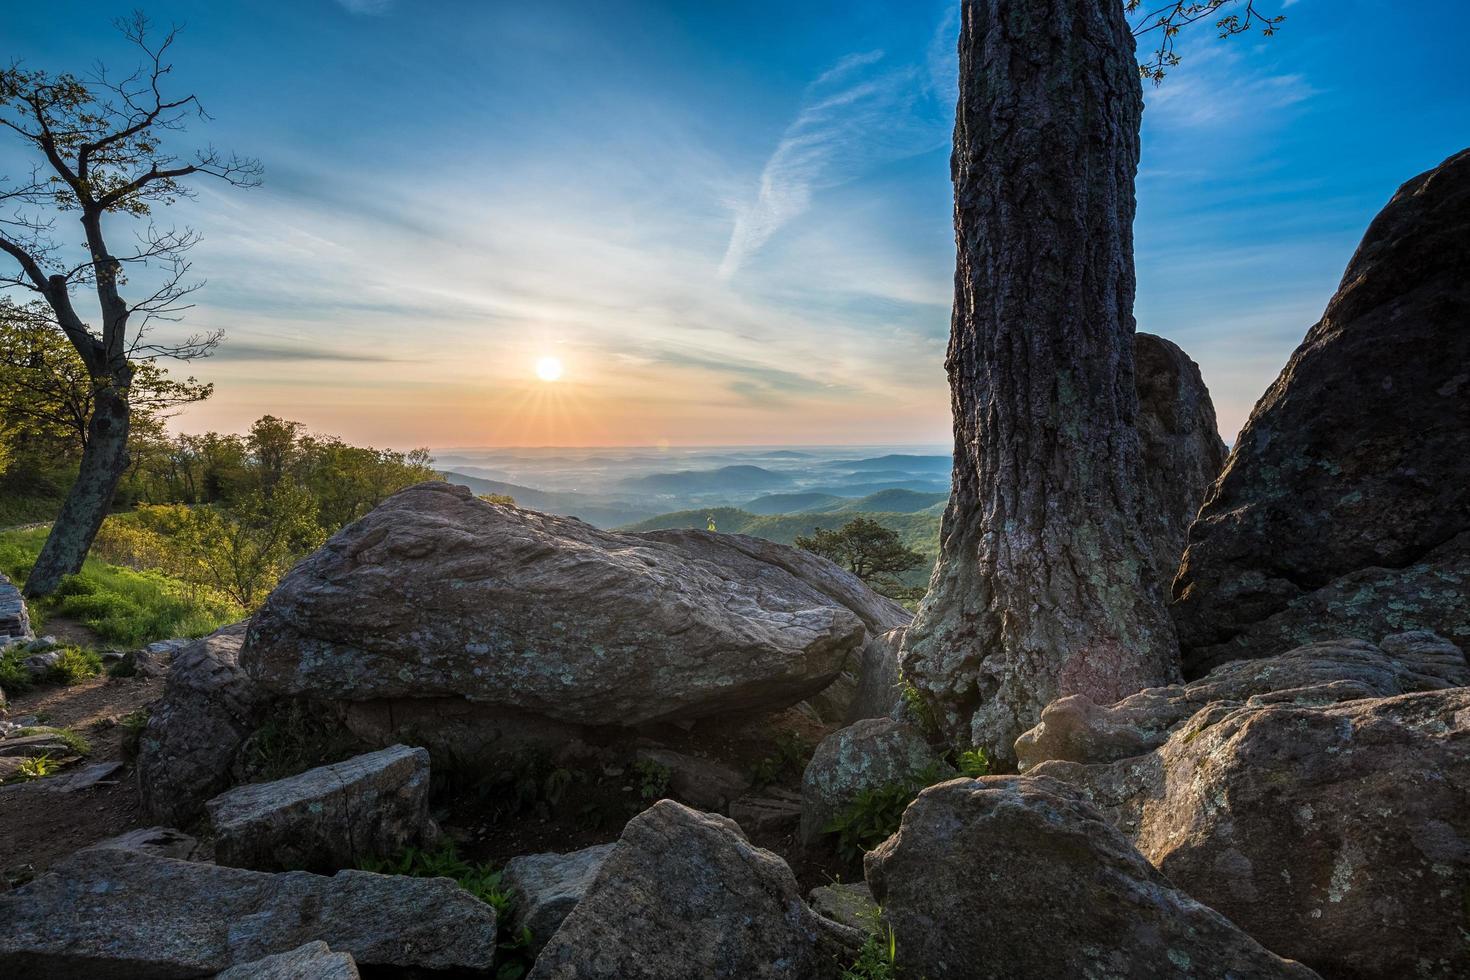 zonsopgang bij shenandoah national park in virginia foto